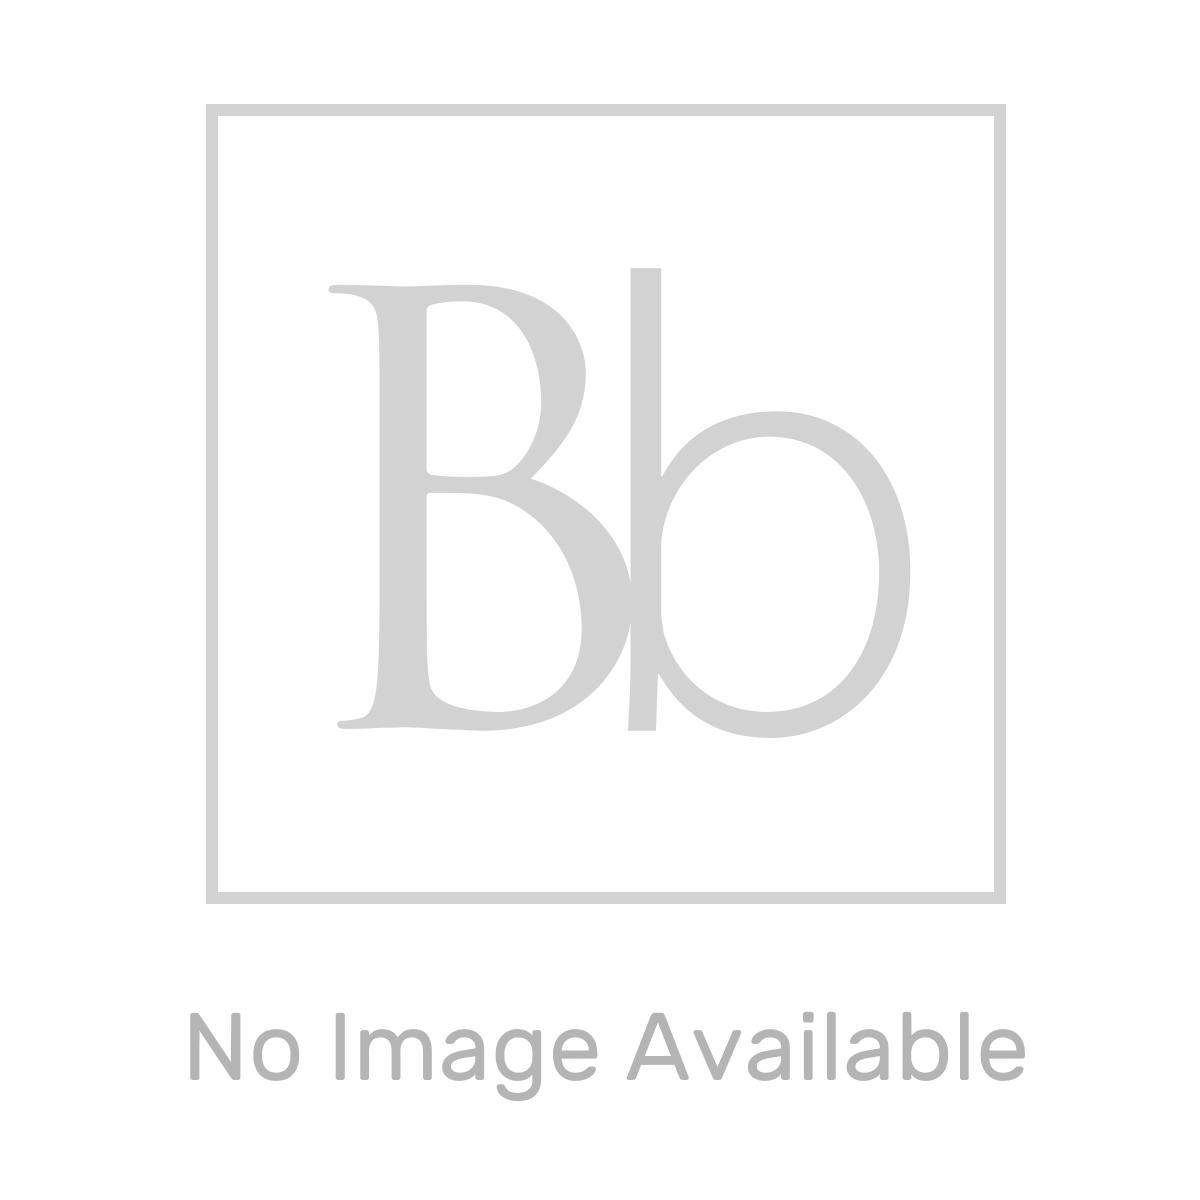 Frontline Pano 3 Tap Hole Bath Shower Mixer Tap